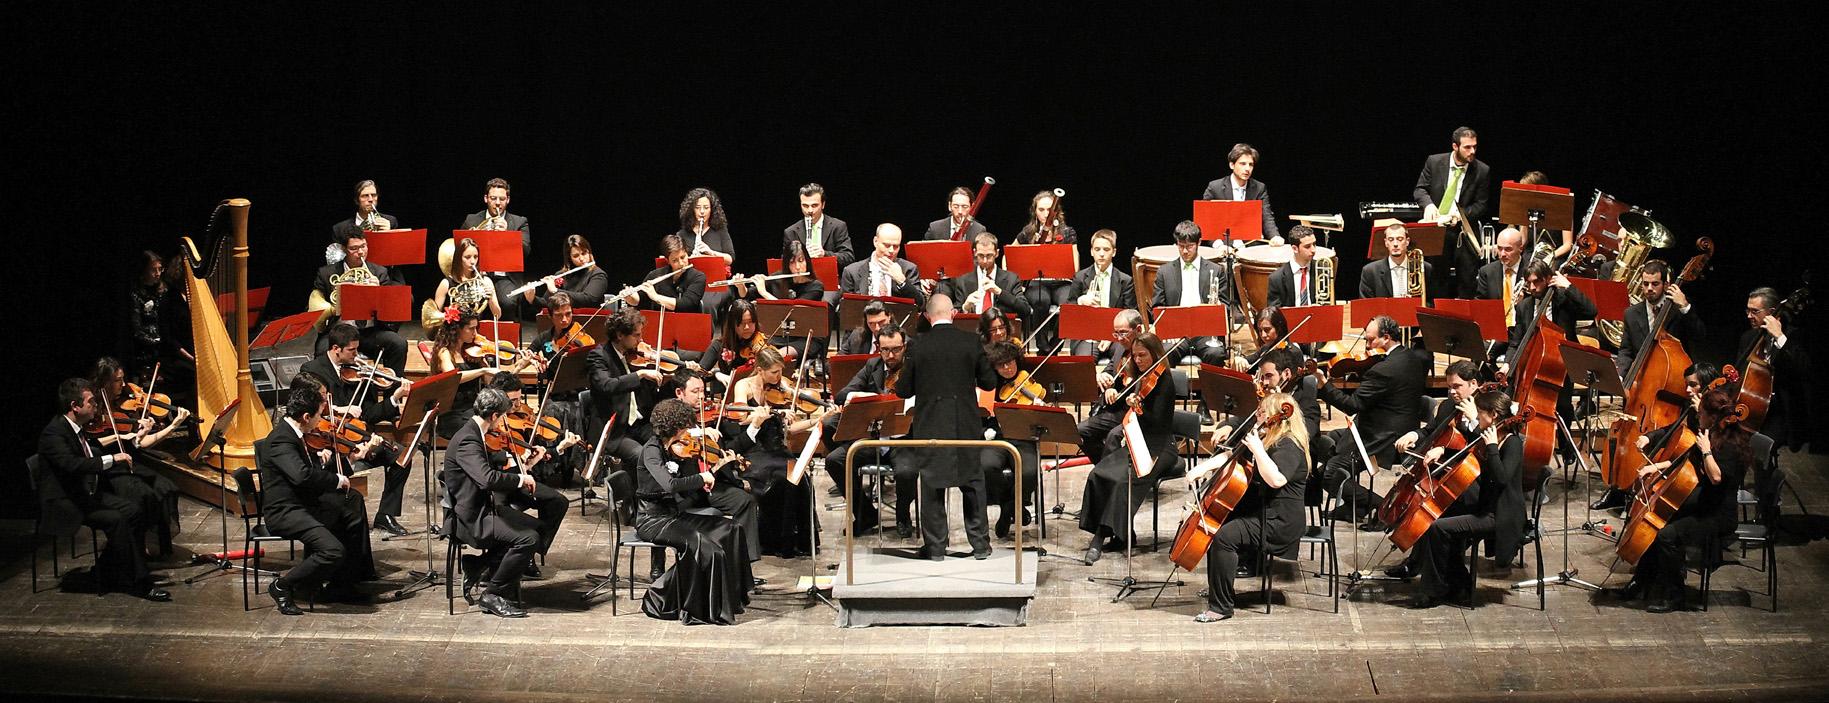 orchestra-RID